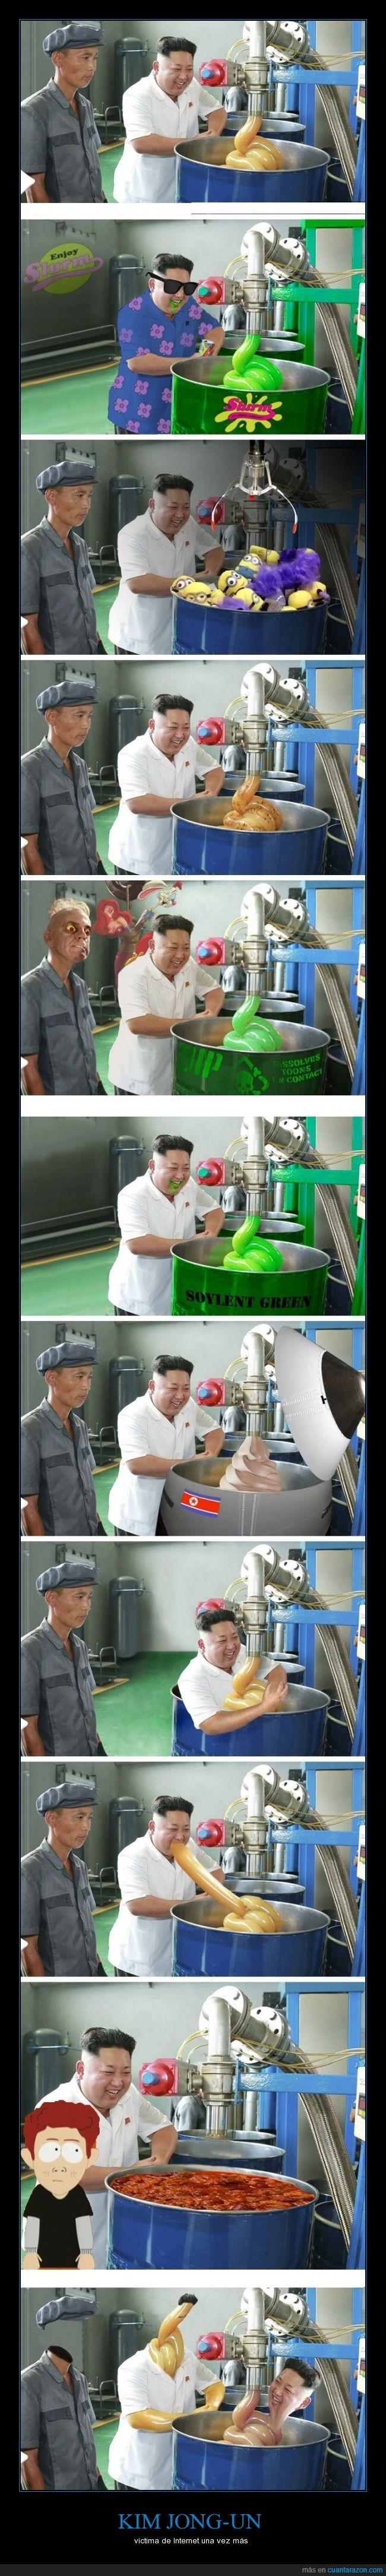 bromas,burla,chops,corea,fabrica,internet,kim joung un,lider,minions